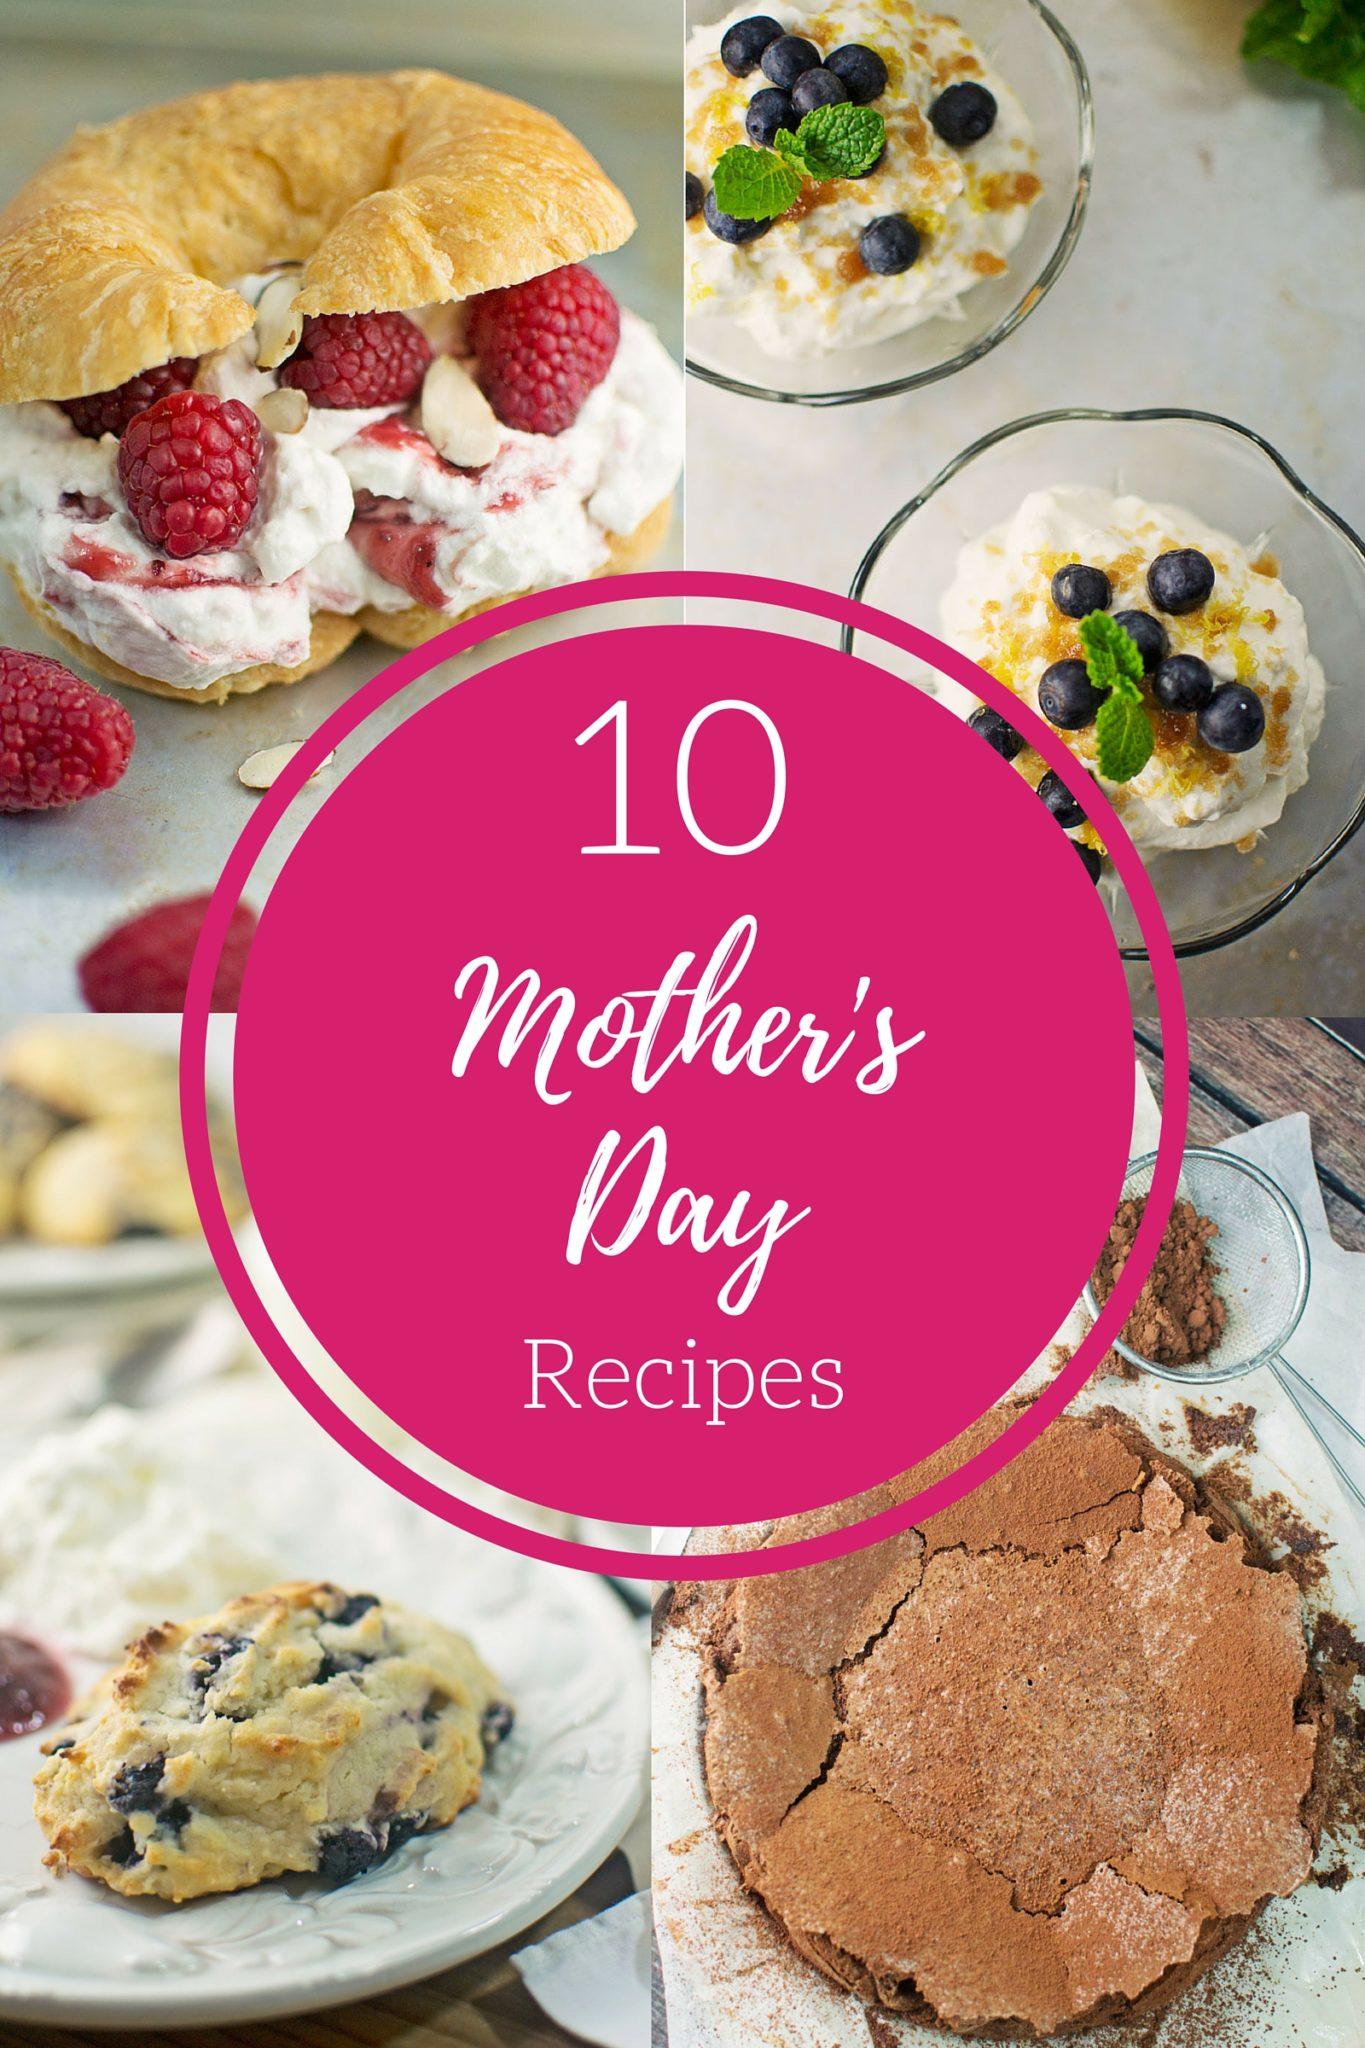 10 wonderfully sweet Mother's Day Recipes found @LittleFiggyFood